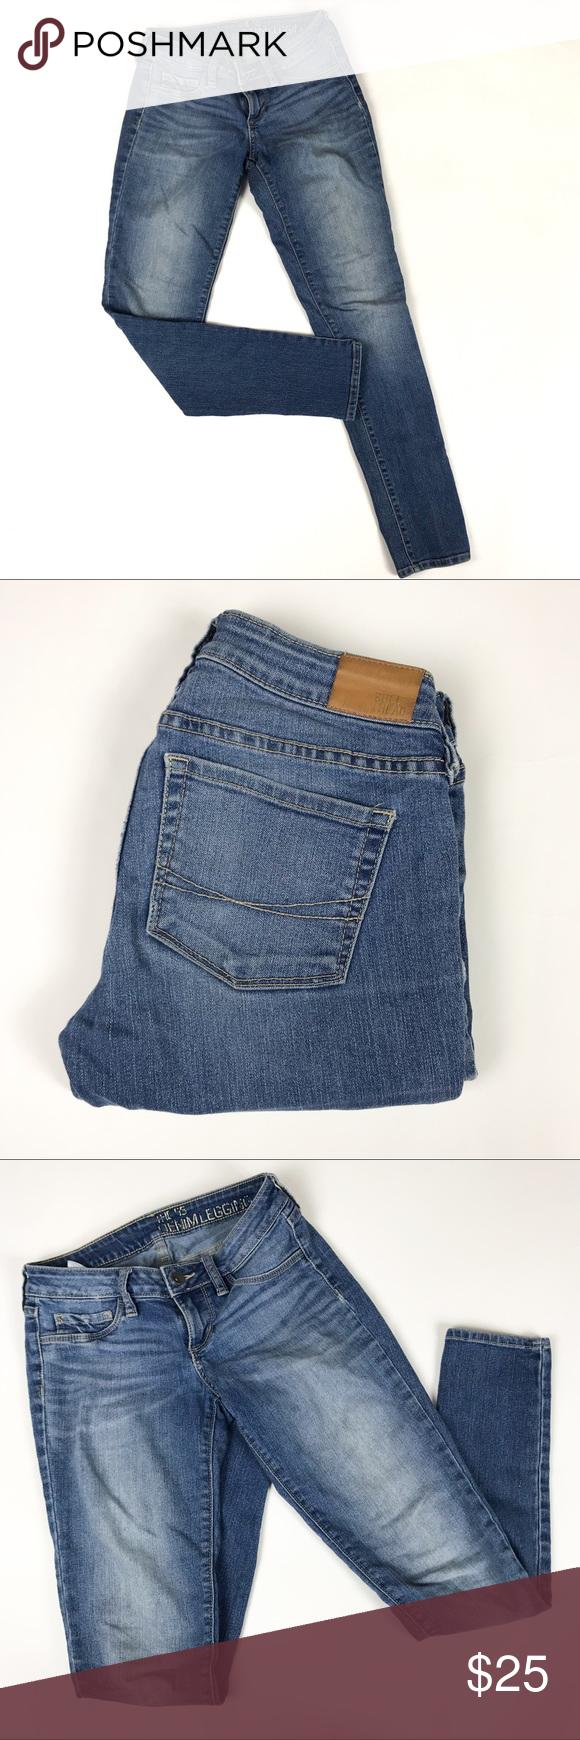 bbaeafc2cbcc8 Bullhead The 55 Denim Legging Dark Blue Jeans Bullhead The 55 Denim Legging  Jeans from PacSun • Size 1 • 82% Cotton / 16% Polyester / 2% Spandex •  Inseam ...